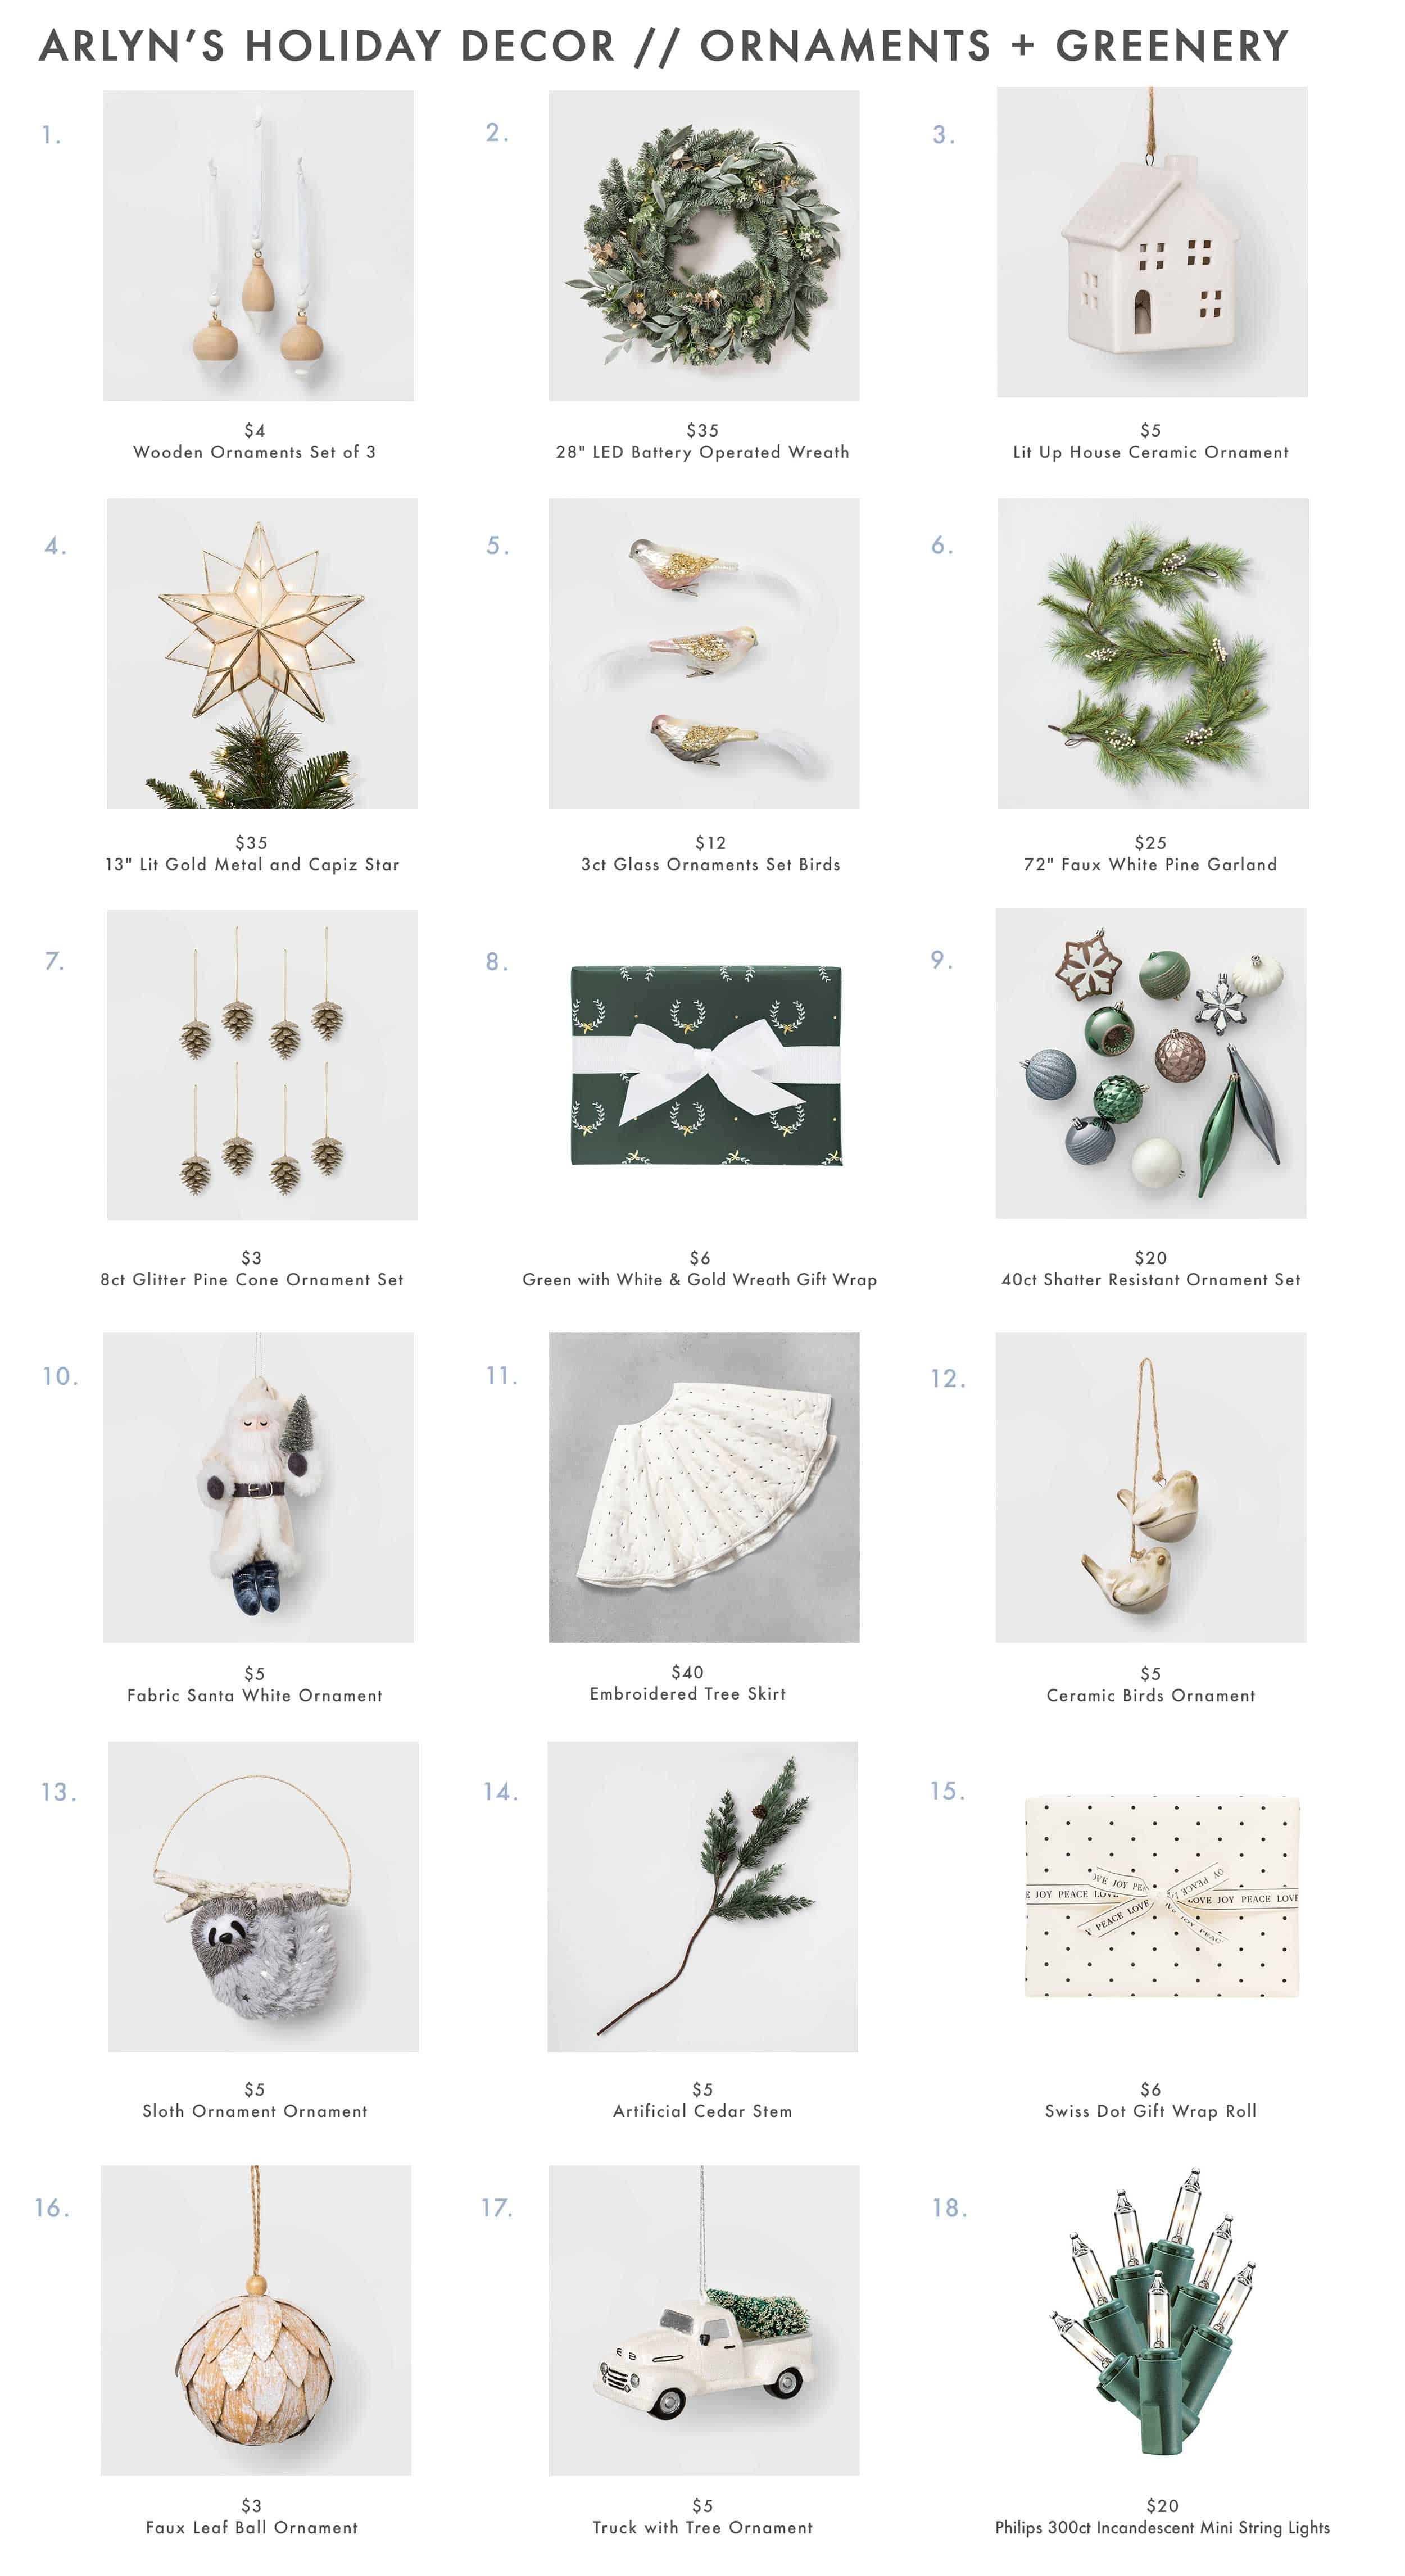 Arlyn's Holiday Decor Ornaments Greenery